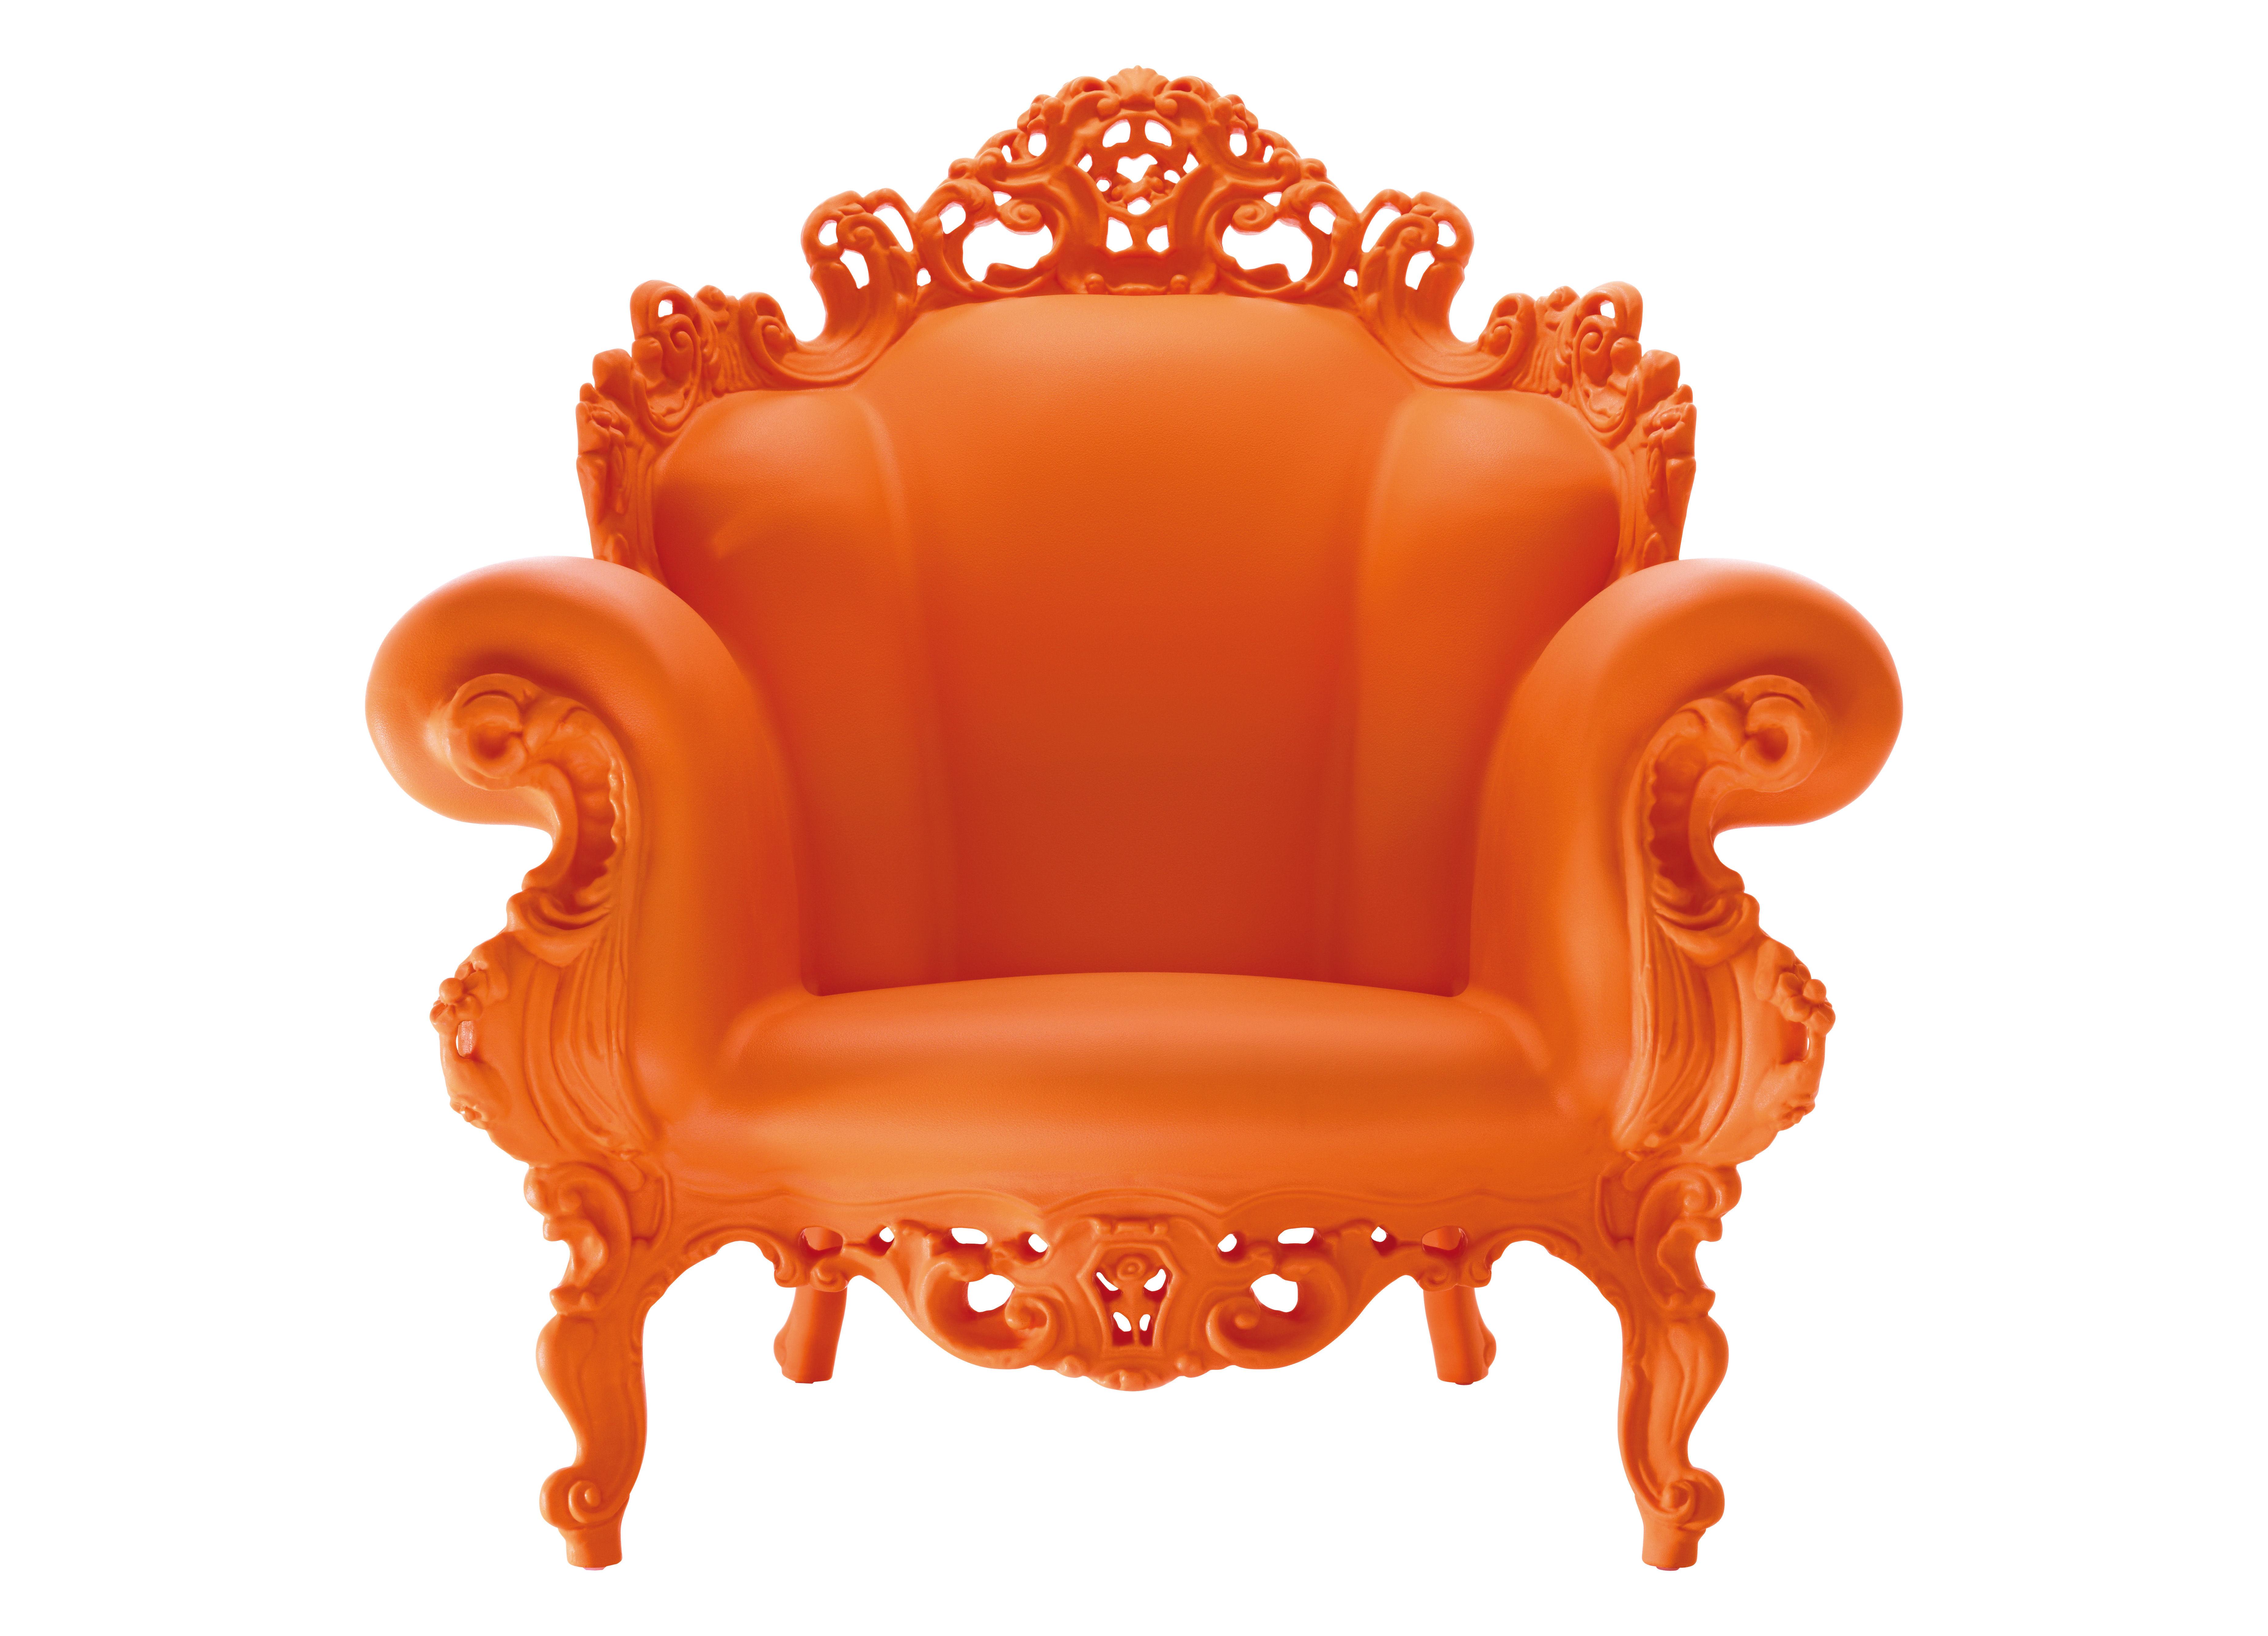 Möbel - Möbel für Teens - Magis Proust Sessel - Magis - Orange - rotationsgeformtes Polyäthylen